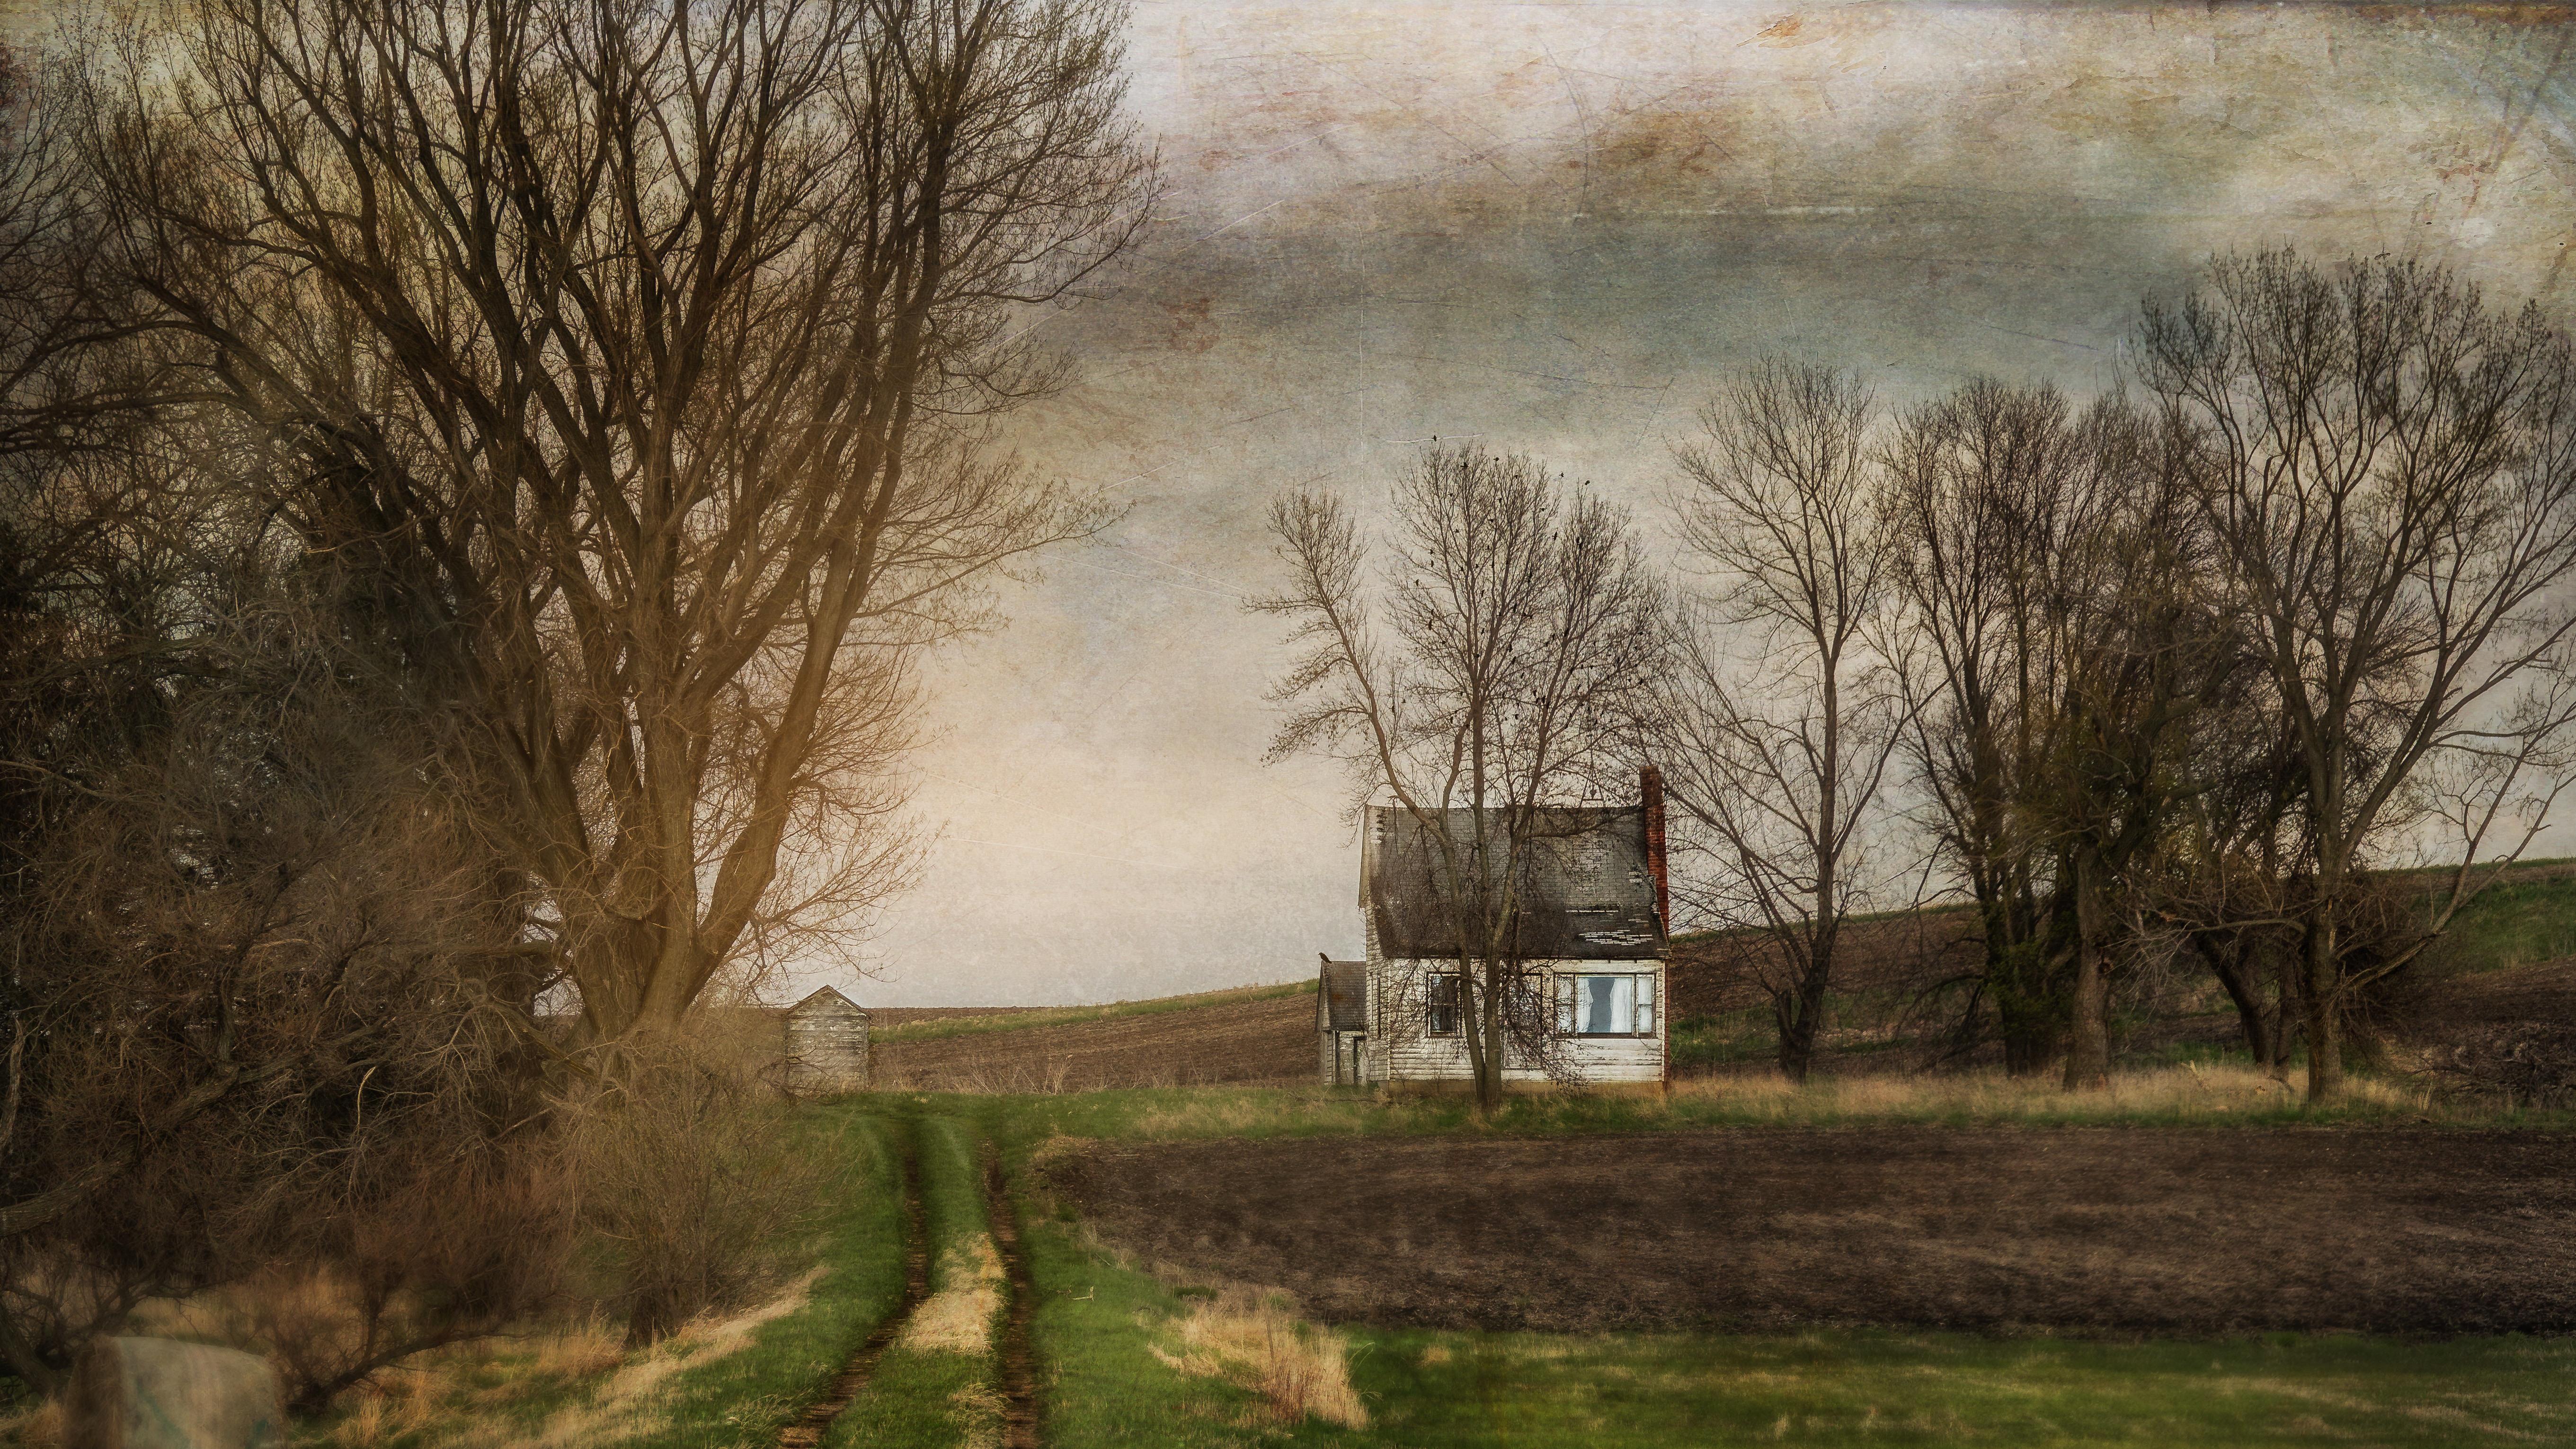 16x9-old-farmhouse-rx10iii-.jpg